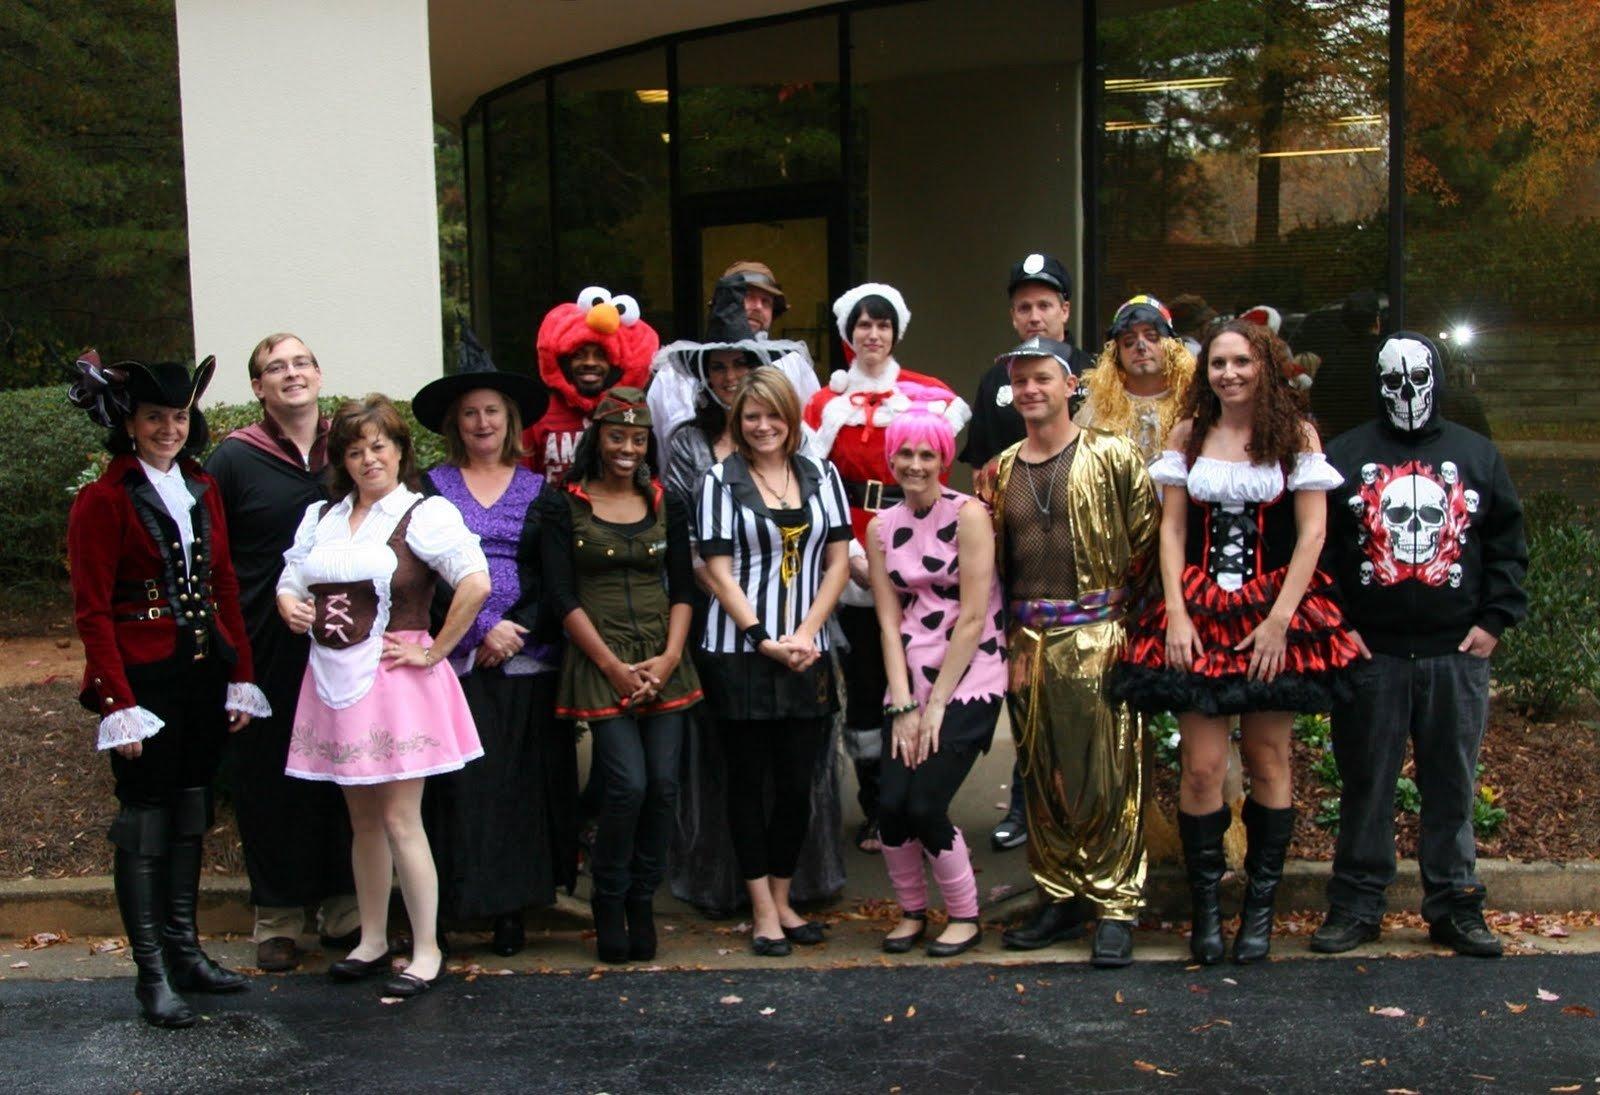 10 Best Group Halloween Costume Ideas For Work annual halloween costume day at mr costumes mr costumes blog 2020